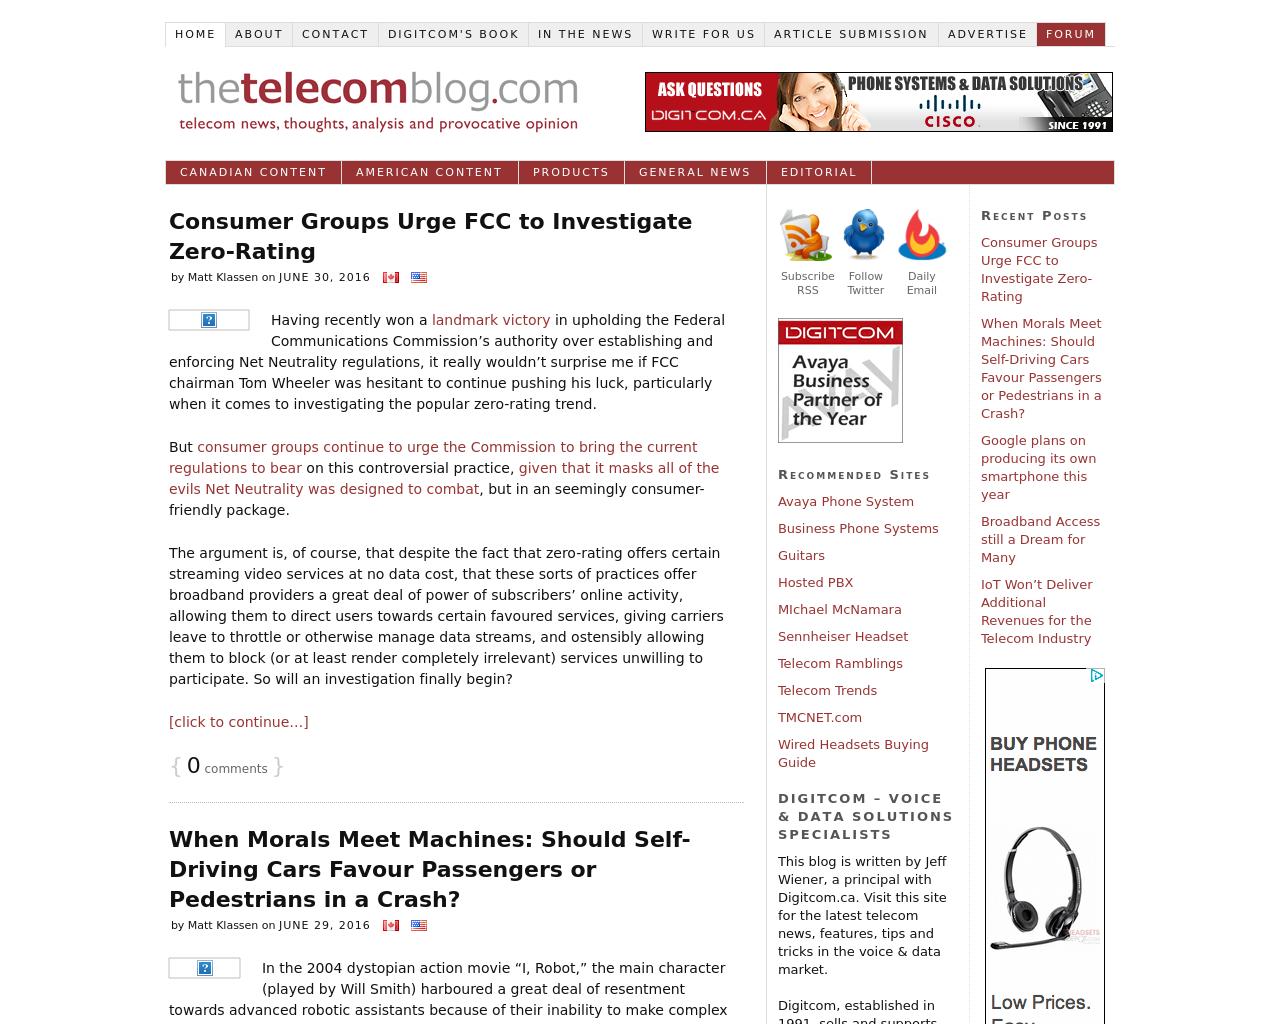 Thetelecomblog.com-Advertising-Reviews-Pricing